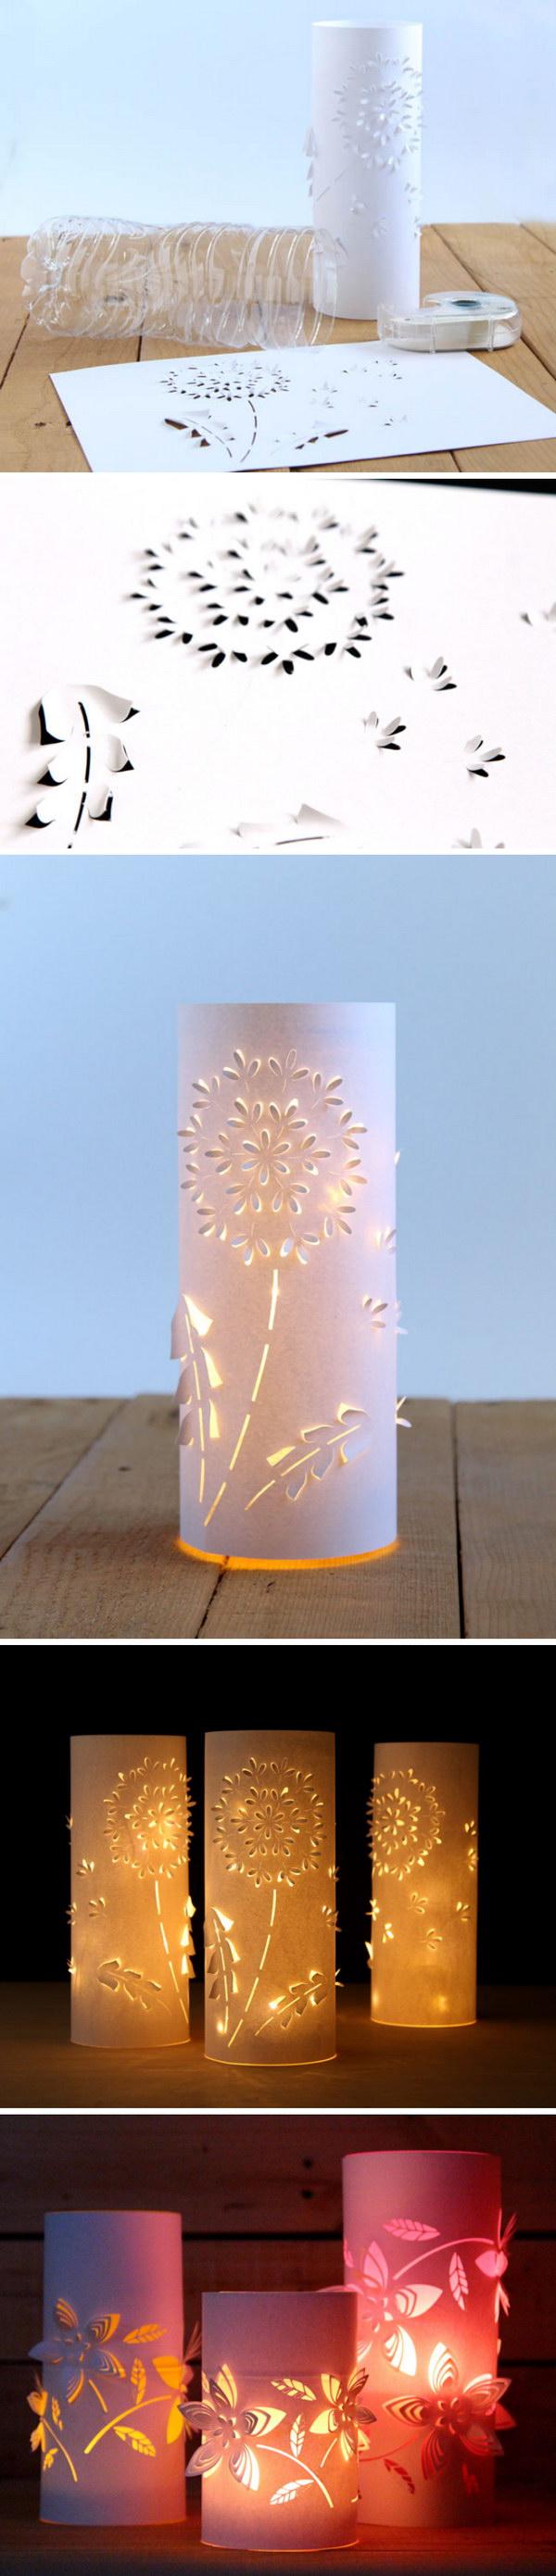 DIY Dandelion Paper Lanterns.